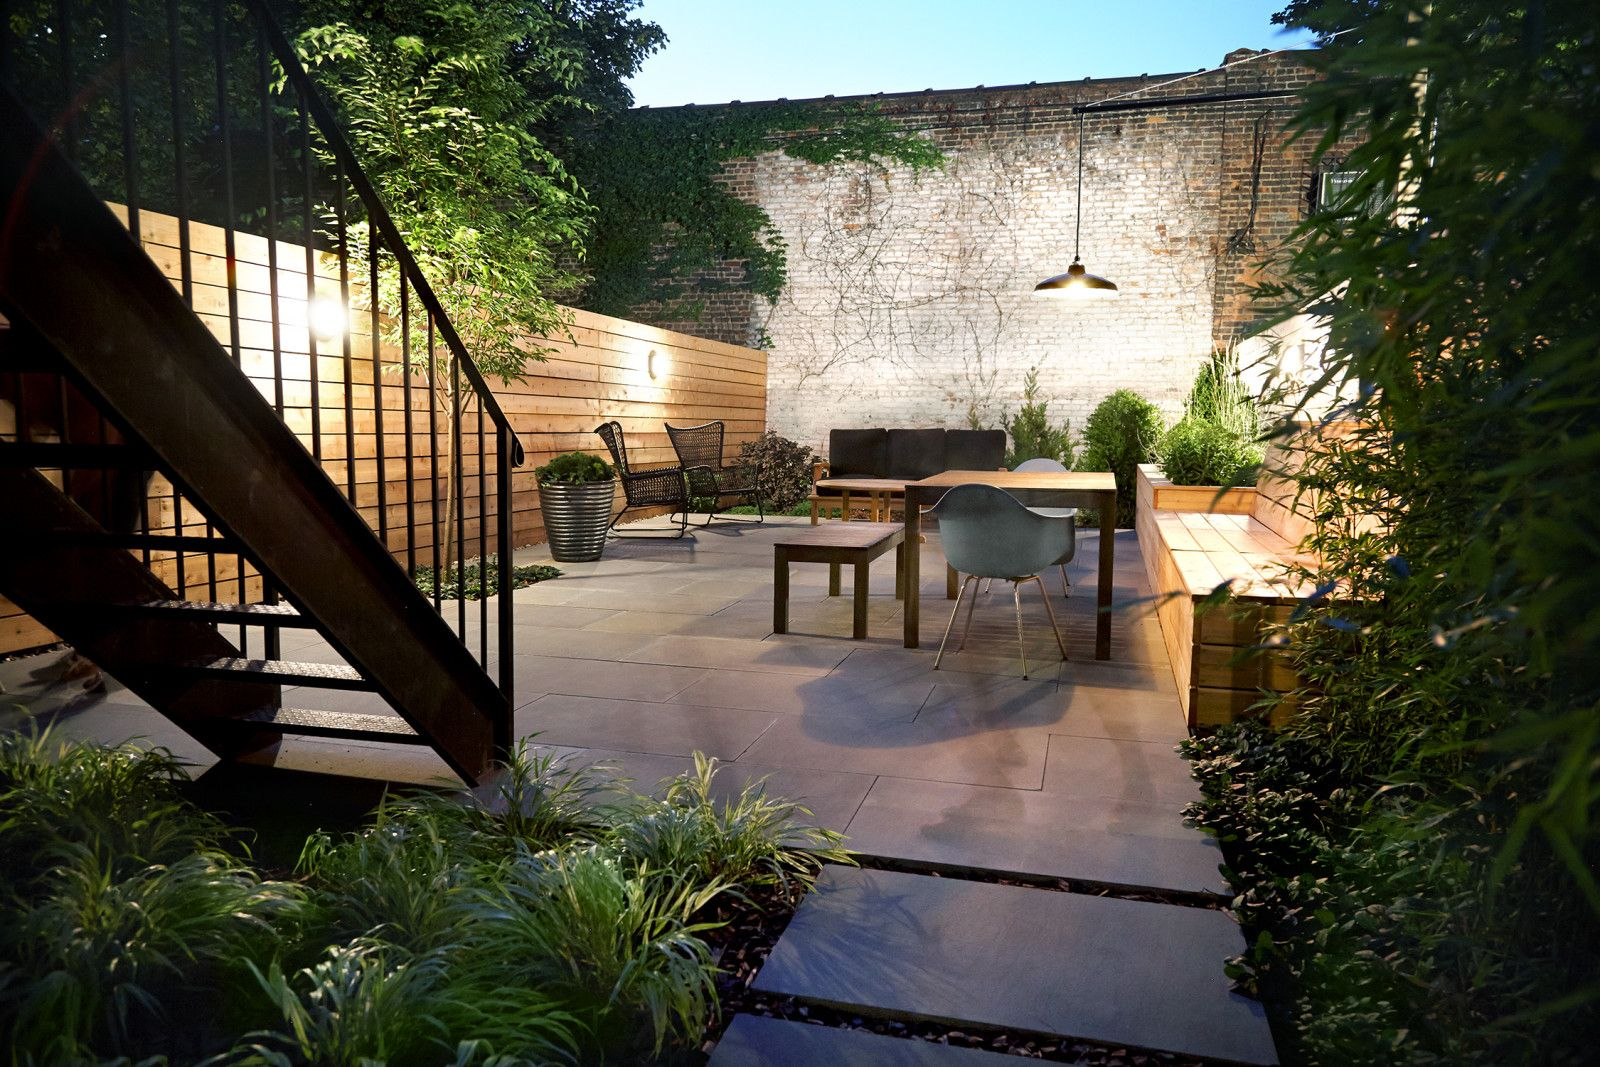 New Eco Landscapes Garden Design Brooklyn Backyard 400 x 300